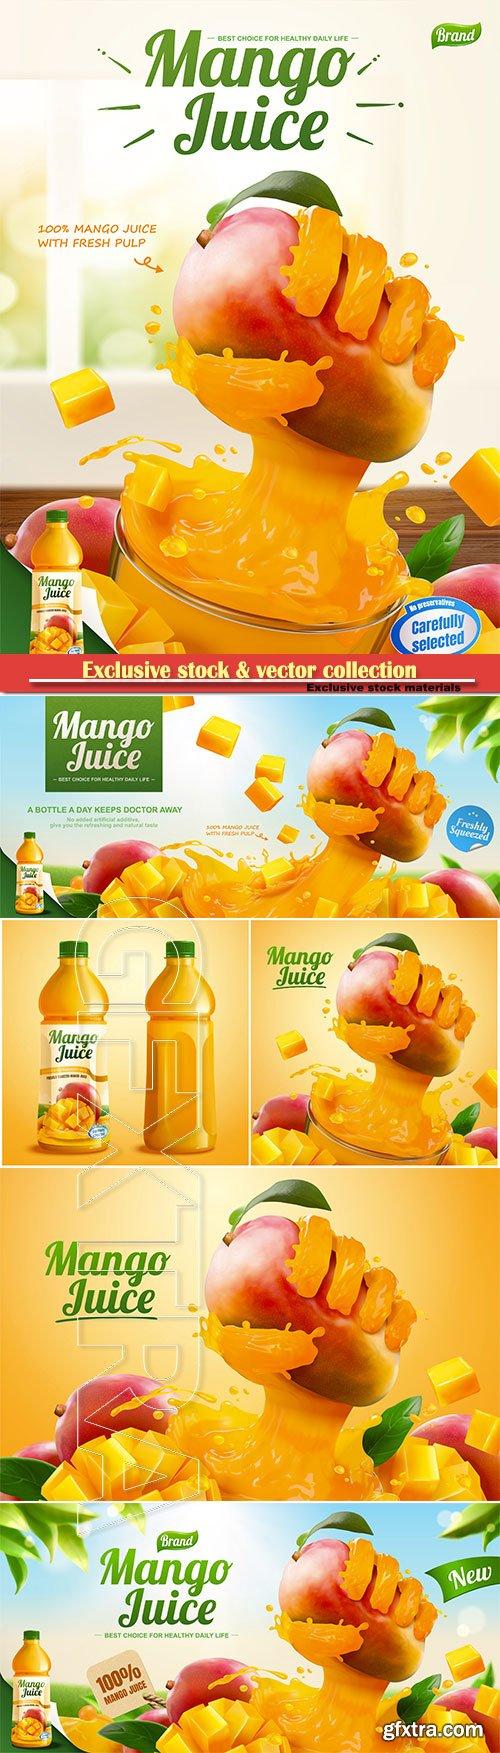 Mango juice banner ads with liquid hand grabbing fruit effect in 3d vector illustration